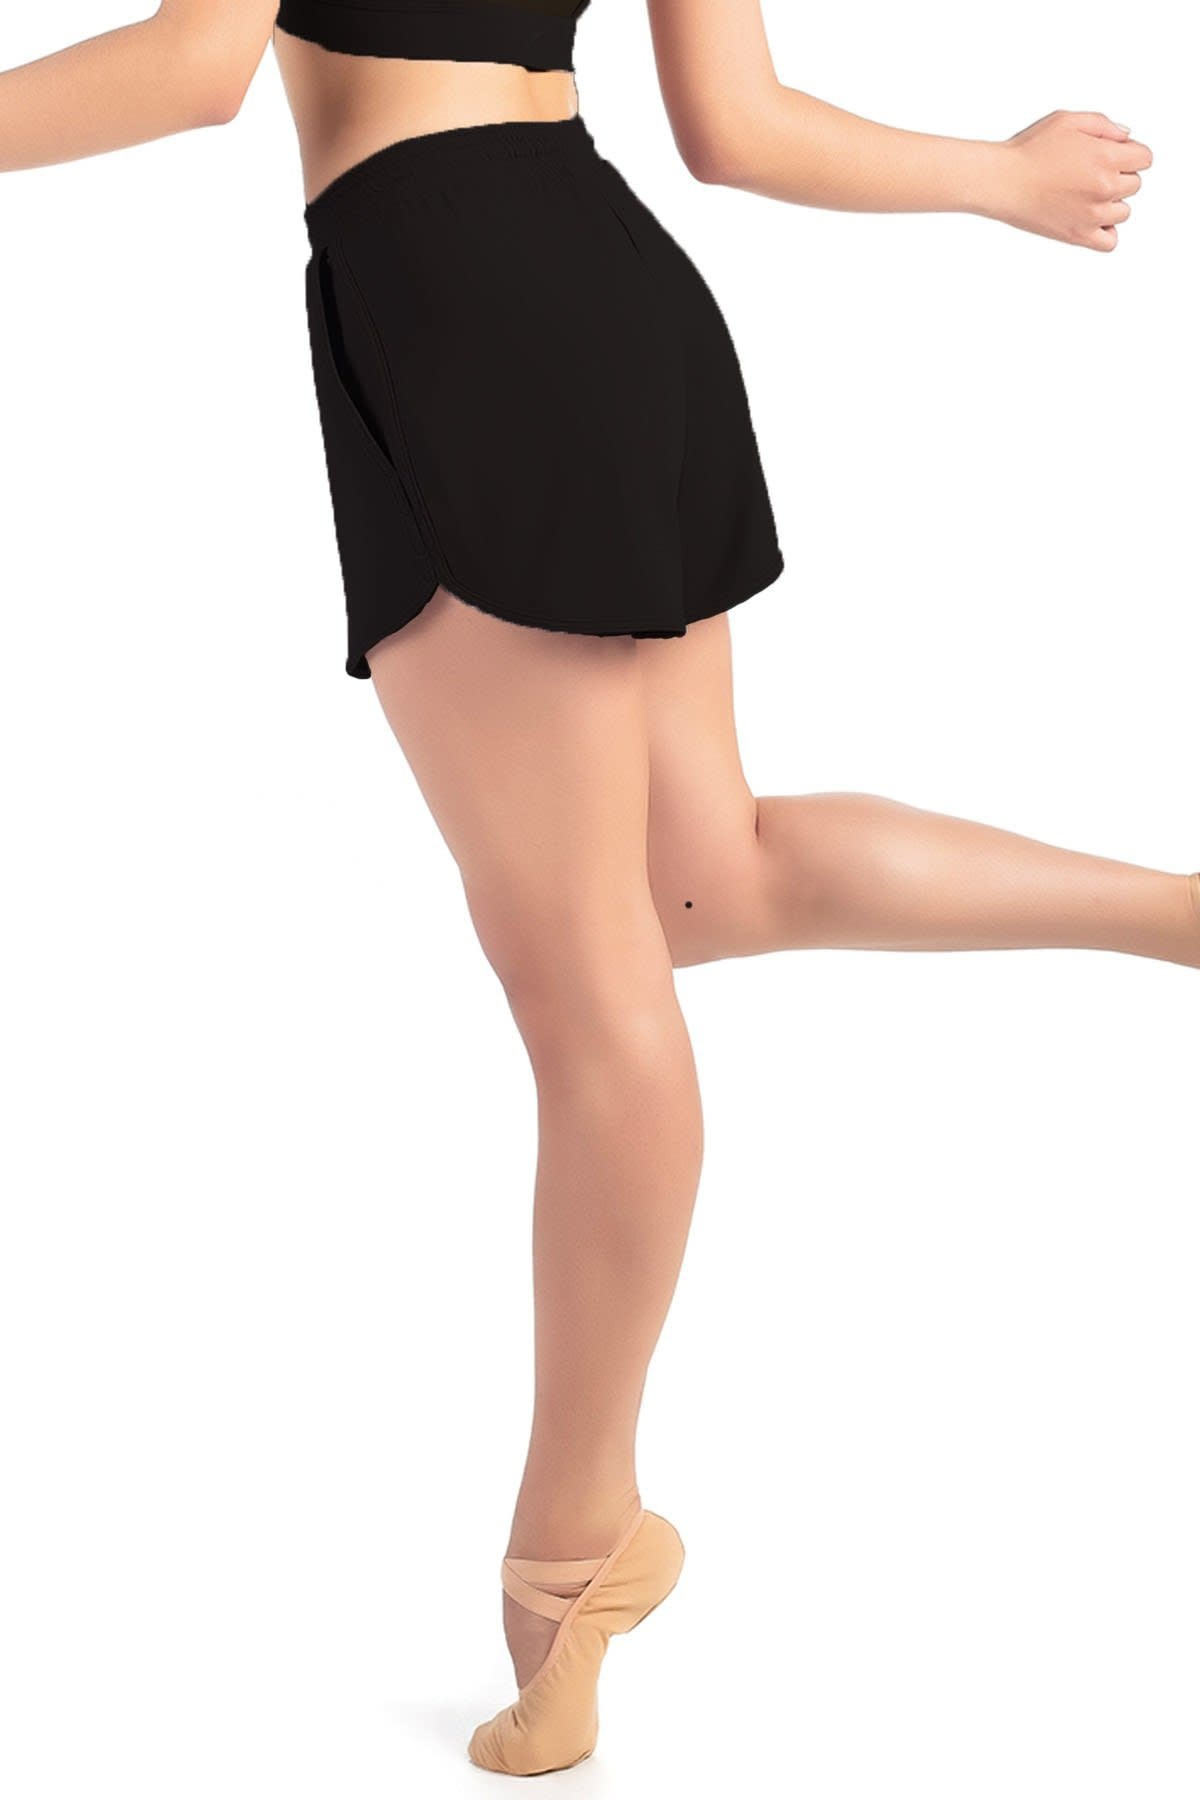 So'Danca RDE1992 Be You Queen Shorts